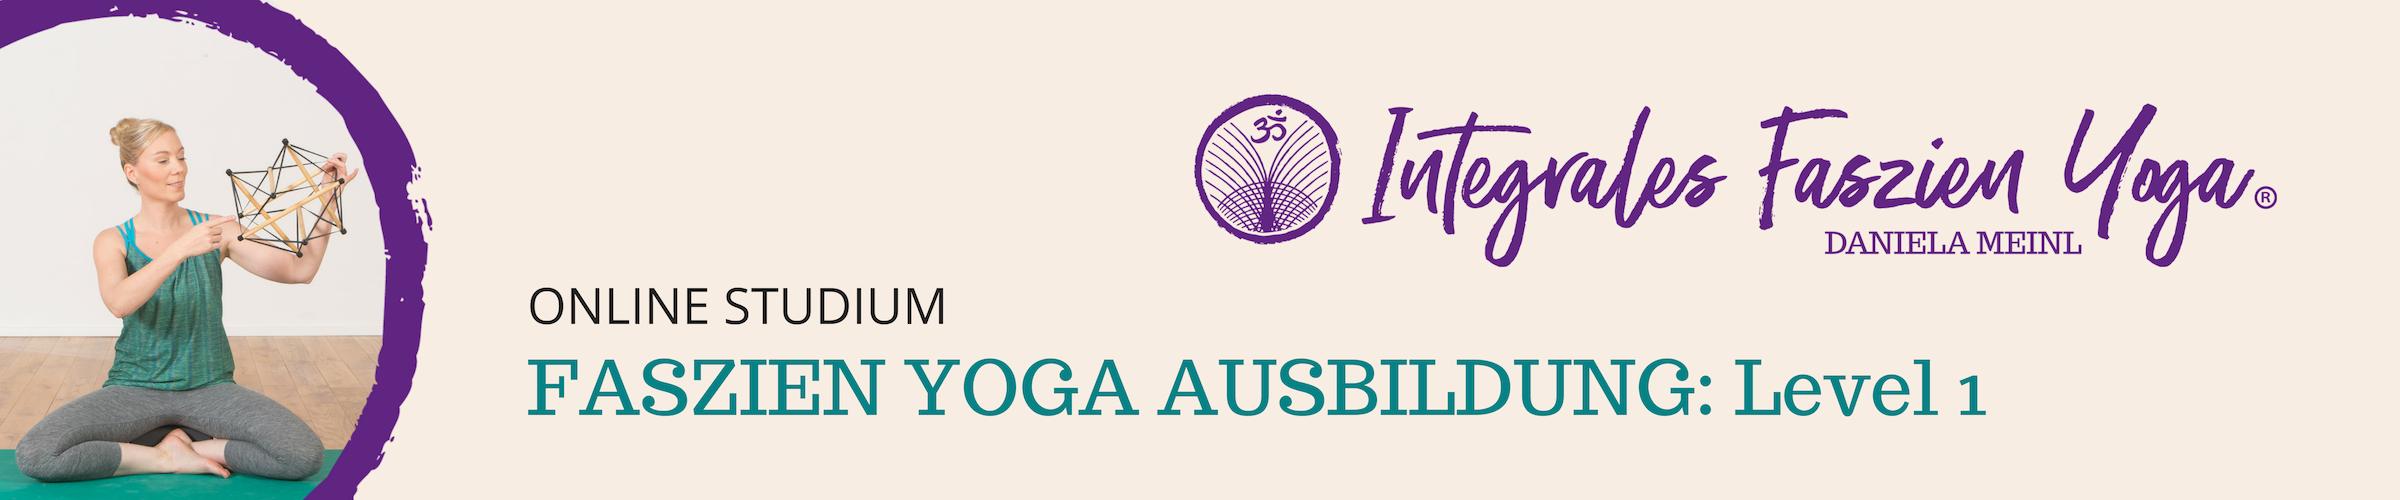 Ausbildung Level 1: Faszien Yoga LehrerIn – online Selbst-Studium